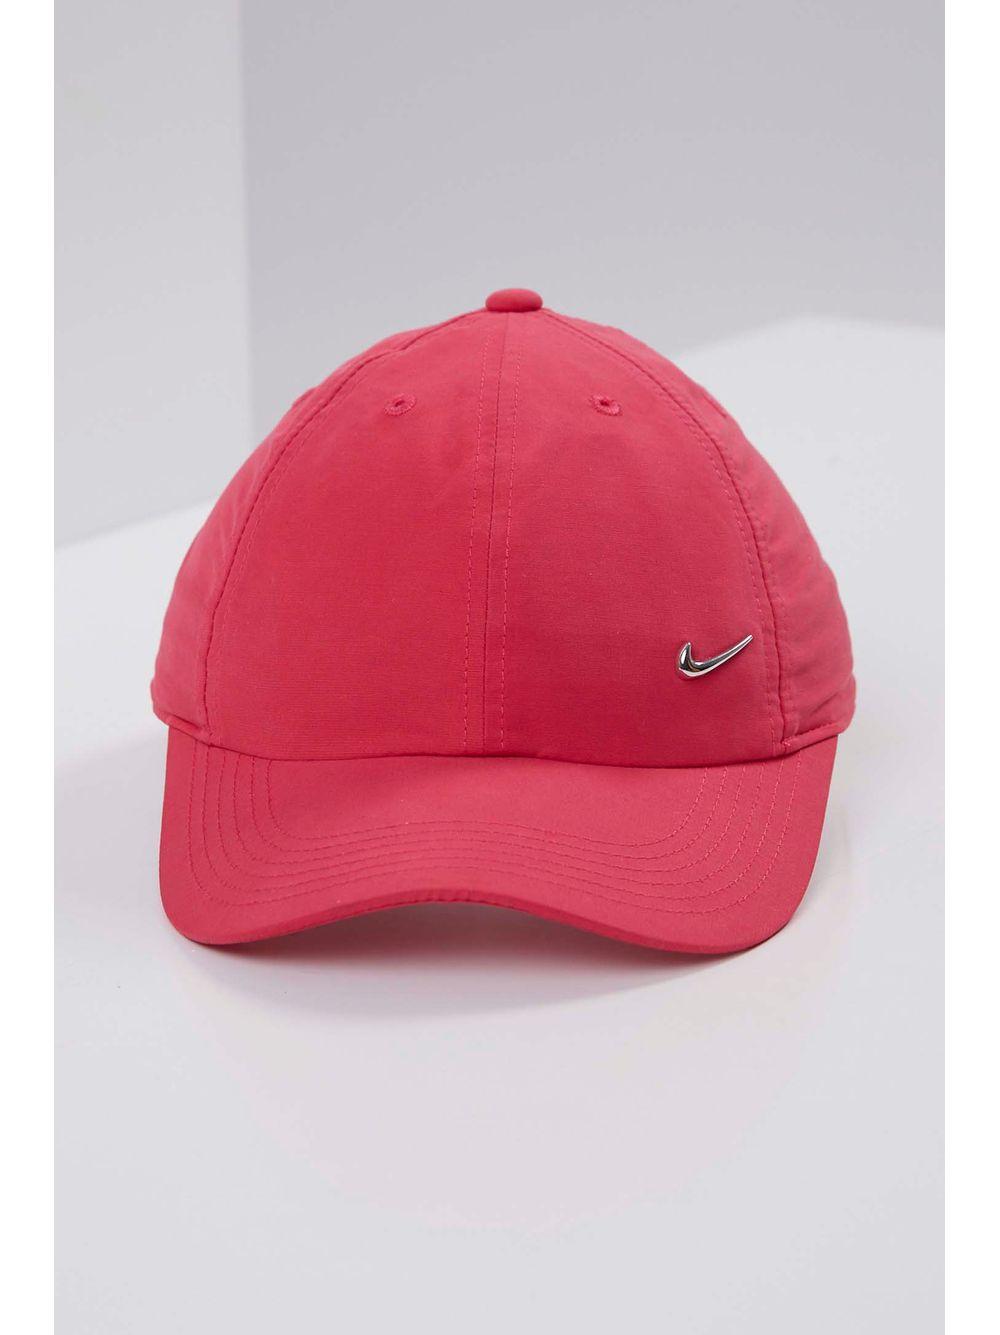 c227ffa66d Boné Nike H86 Cap Rosa - pittol